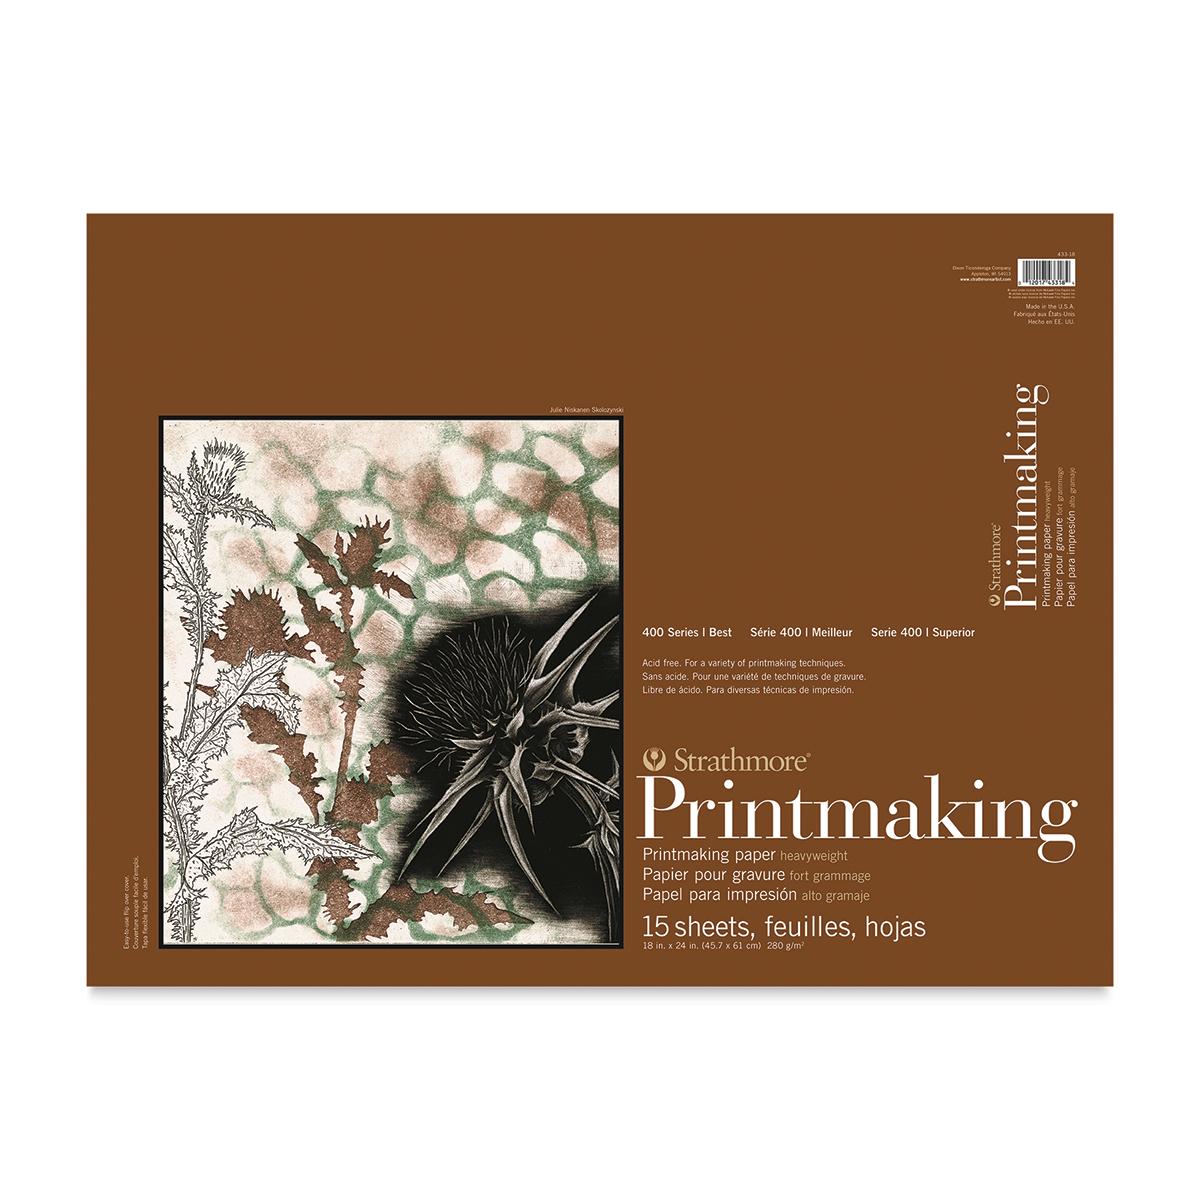 Strathmore 400 Series Printmaking Paper - 18 x 24, 15 Sheets